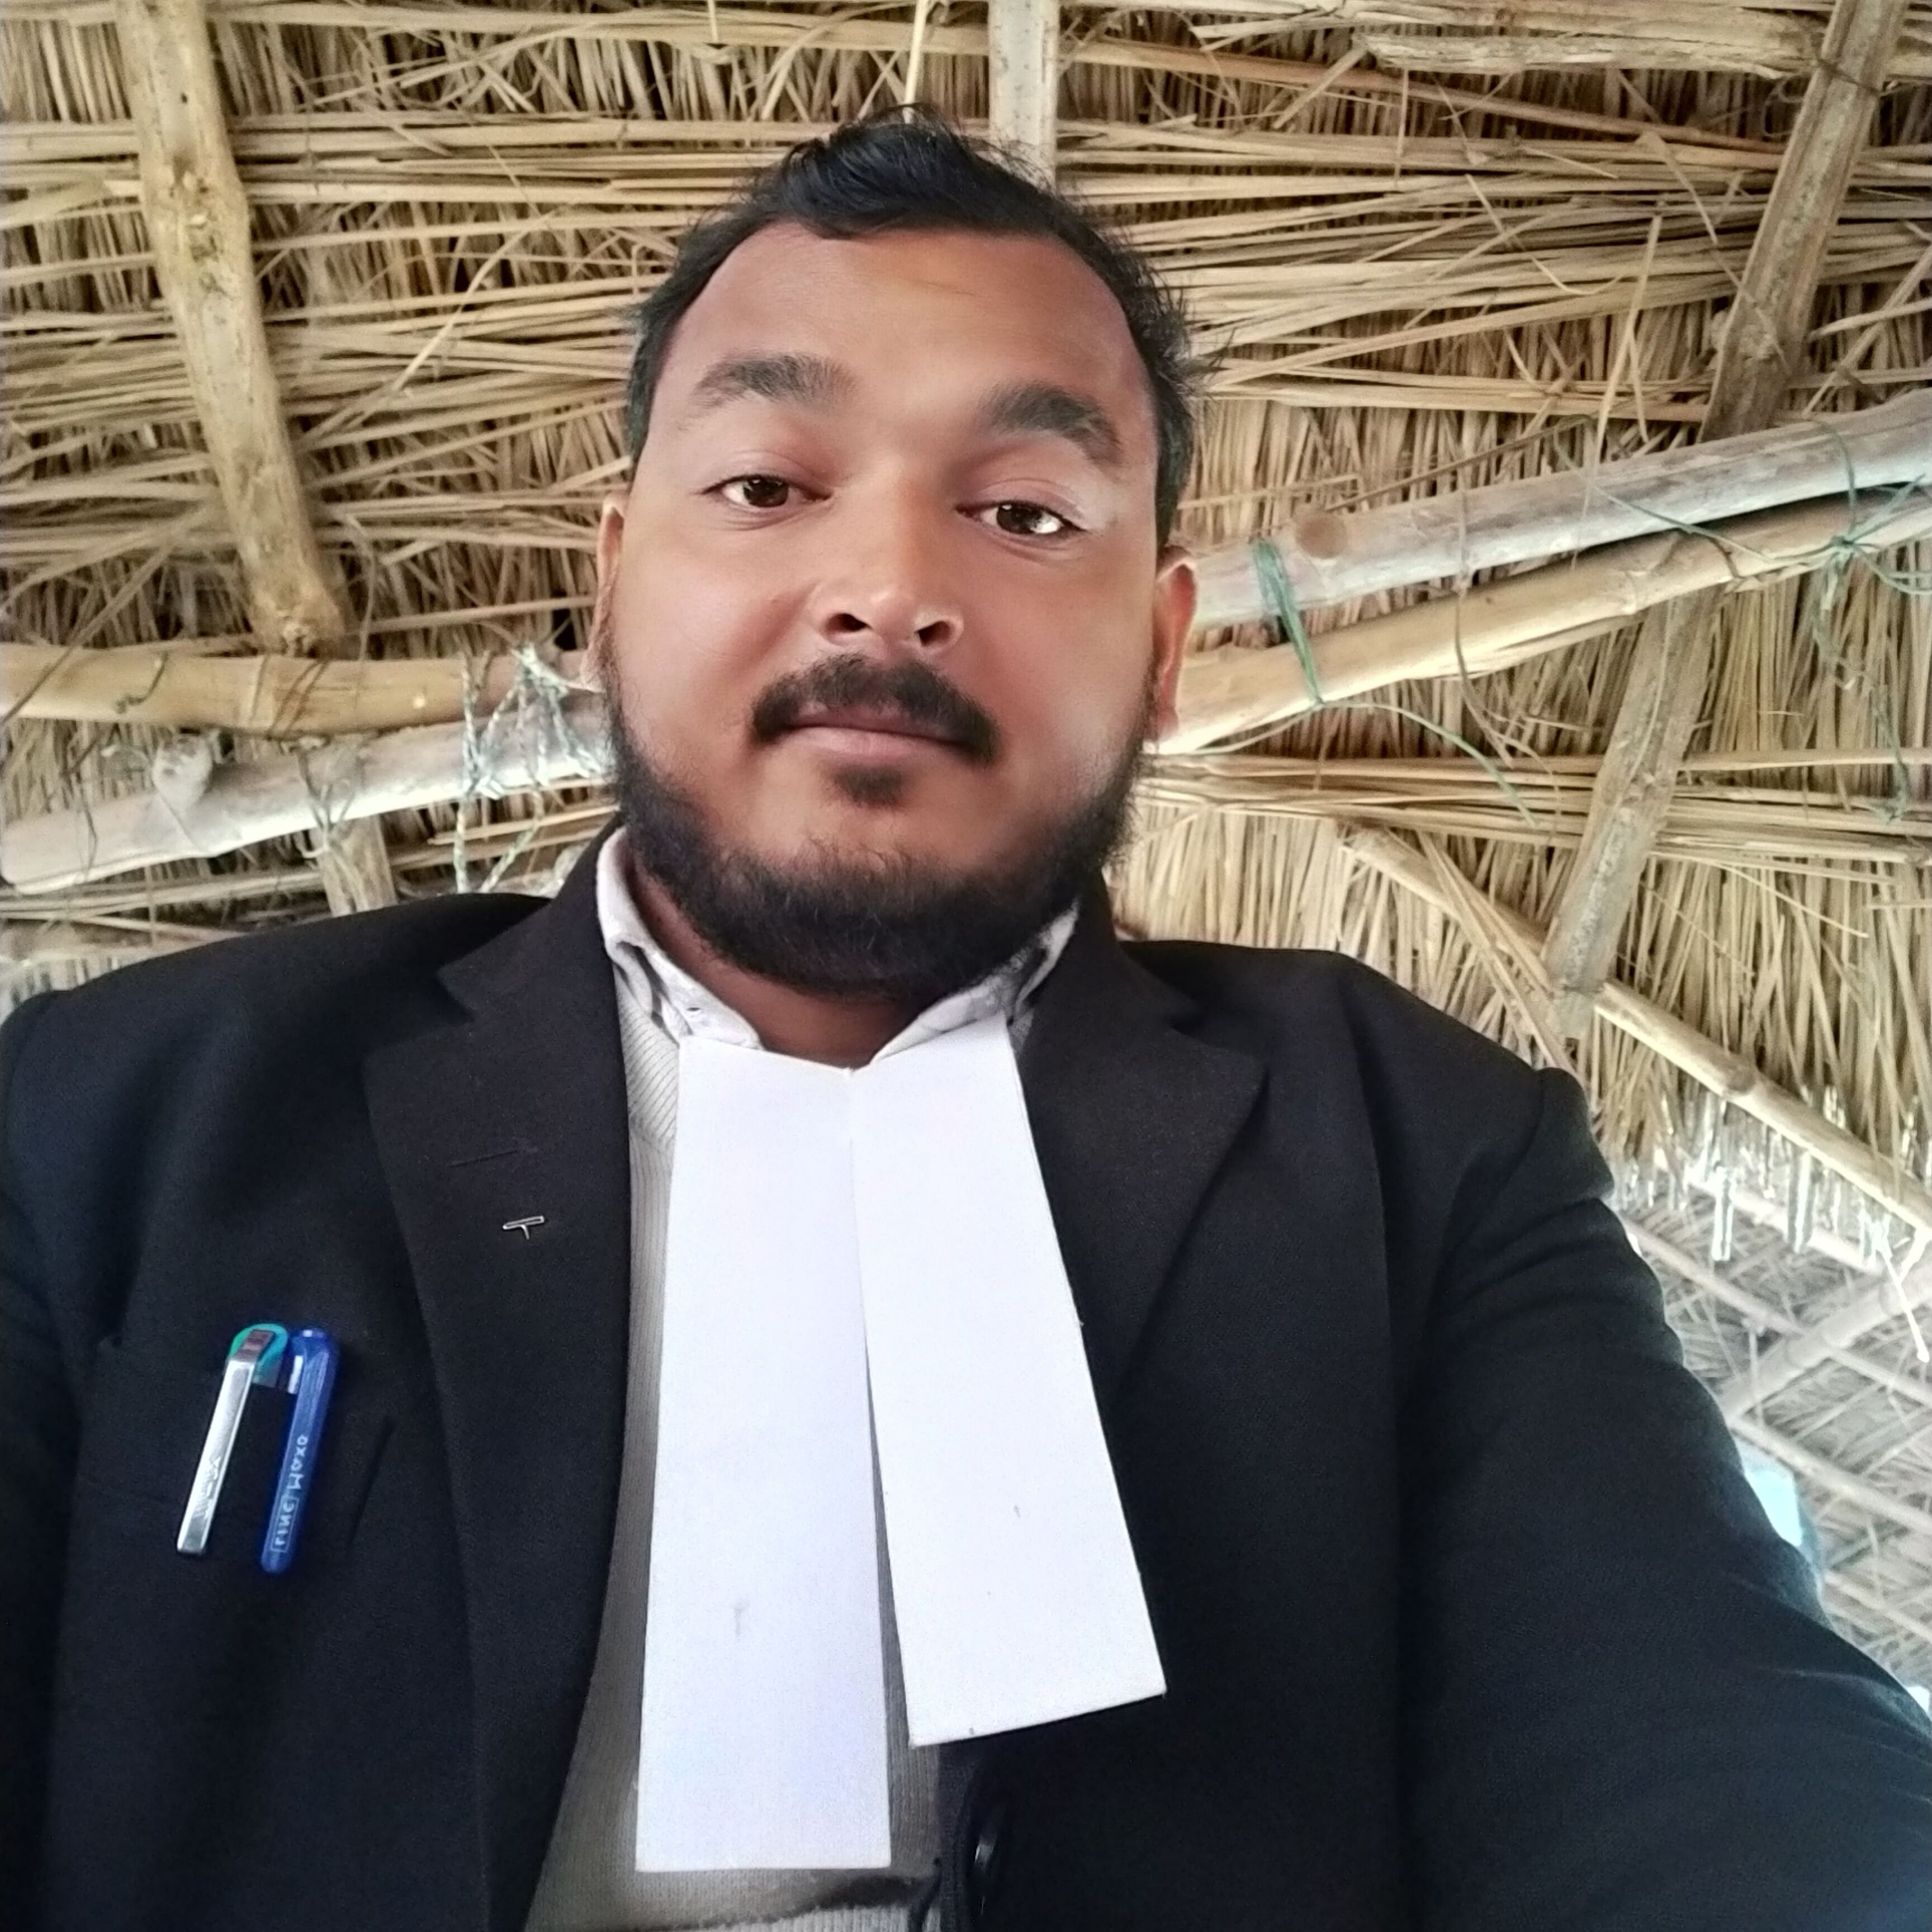 Ashutosh Kumar Yadav